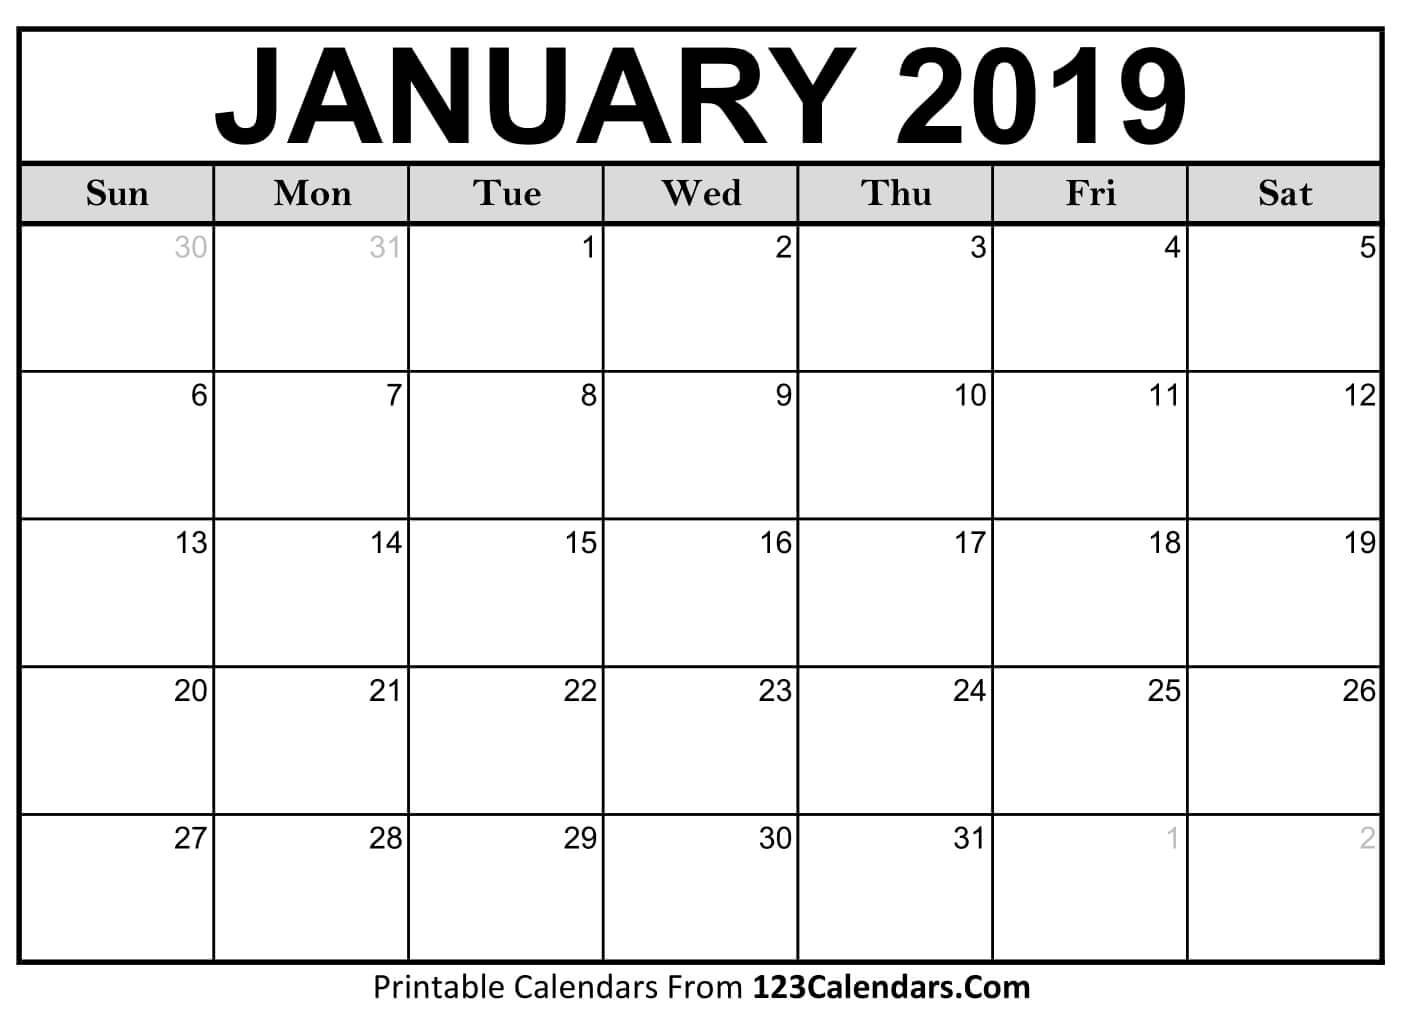 Printable January 2019 Calendar Templates – 123Calendars Calendar 2019 Jan